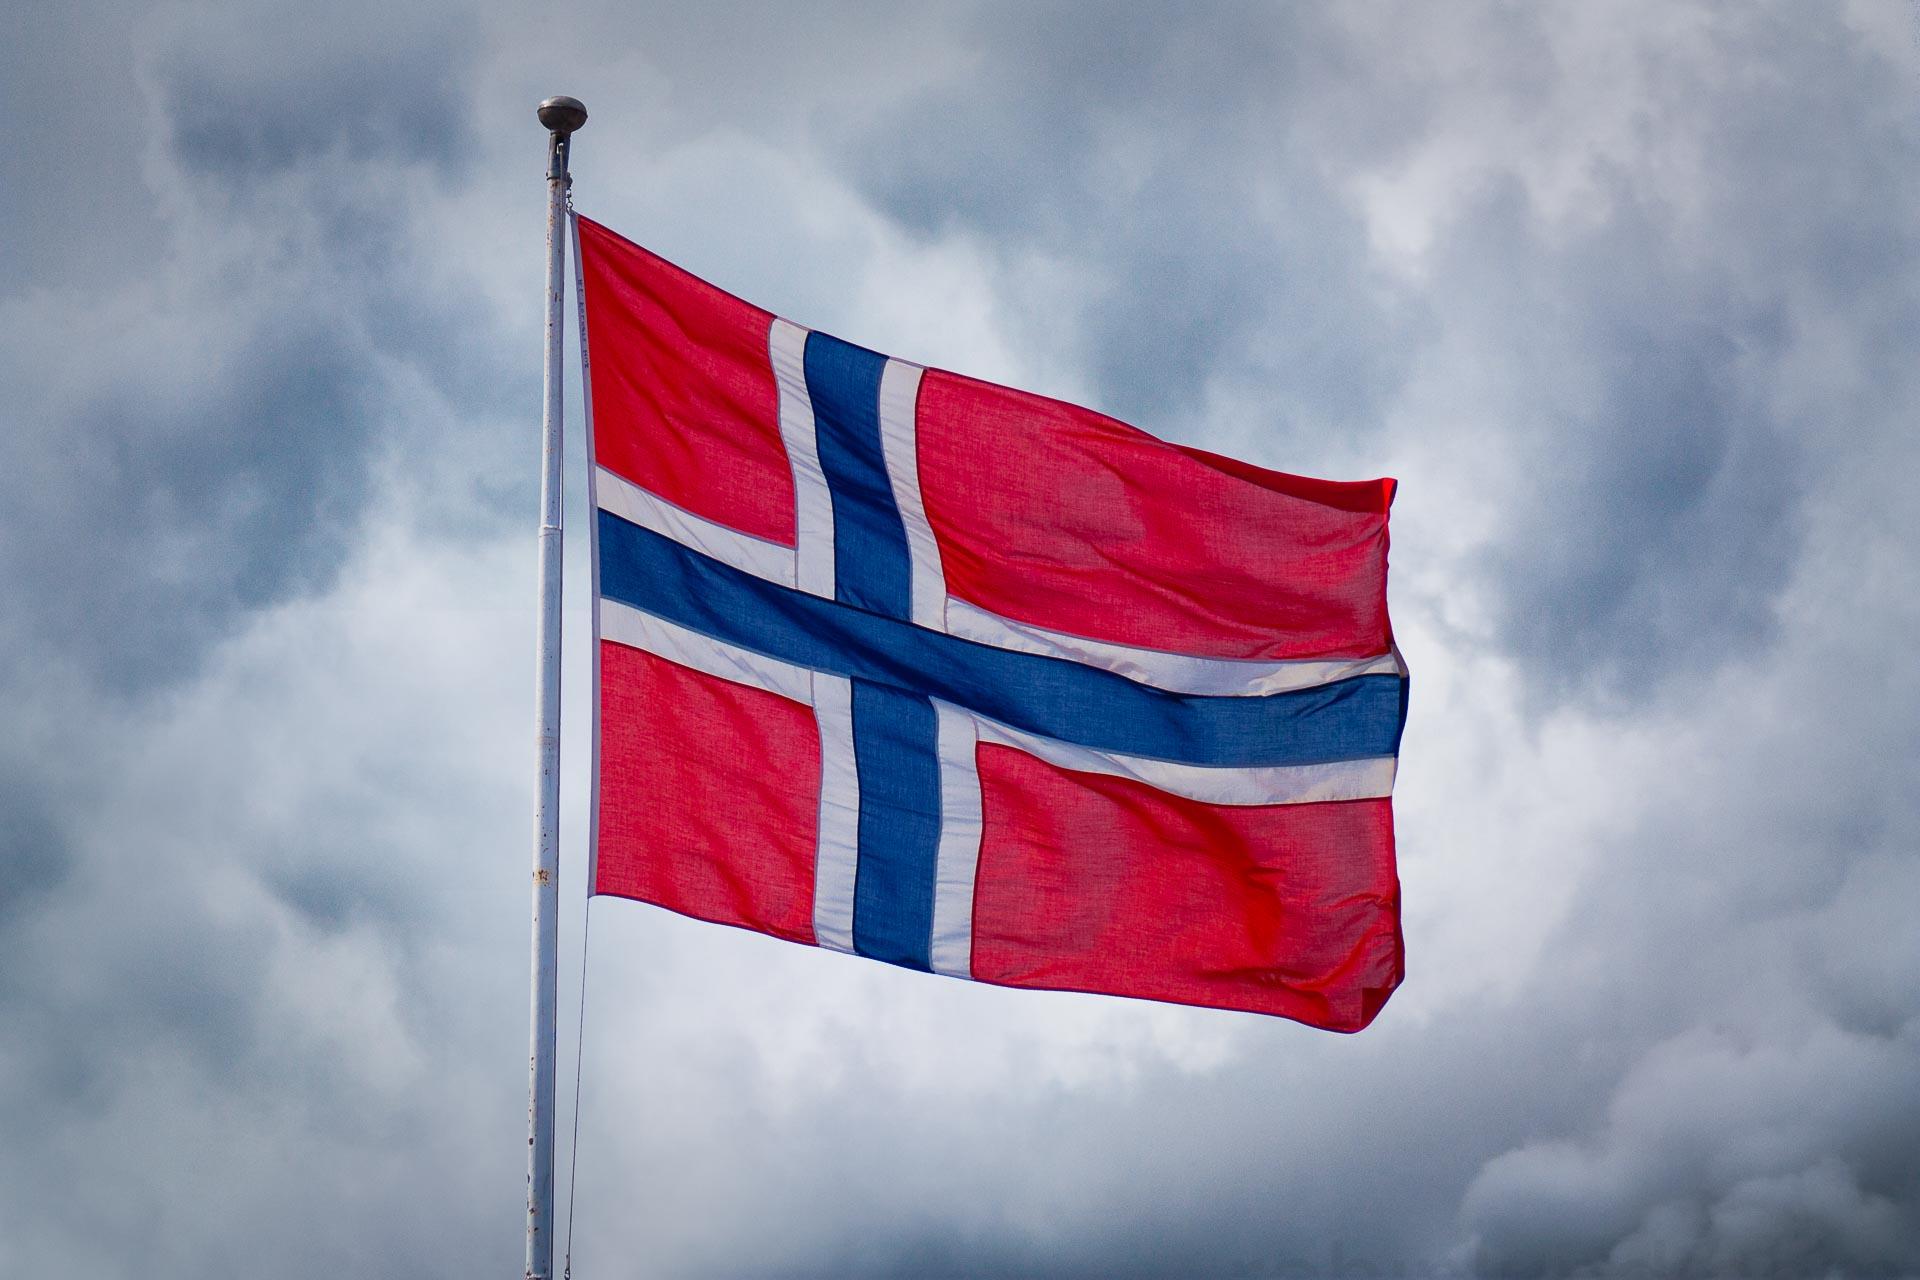 Rich Bar (Norges flagg), betalt